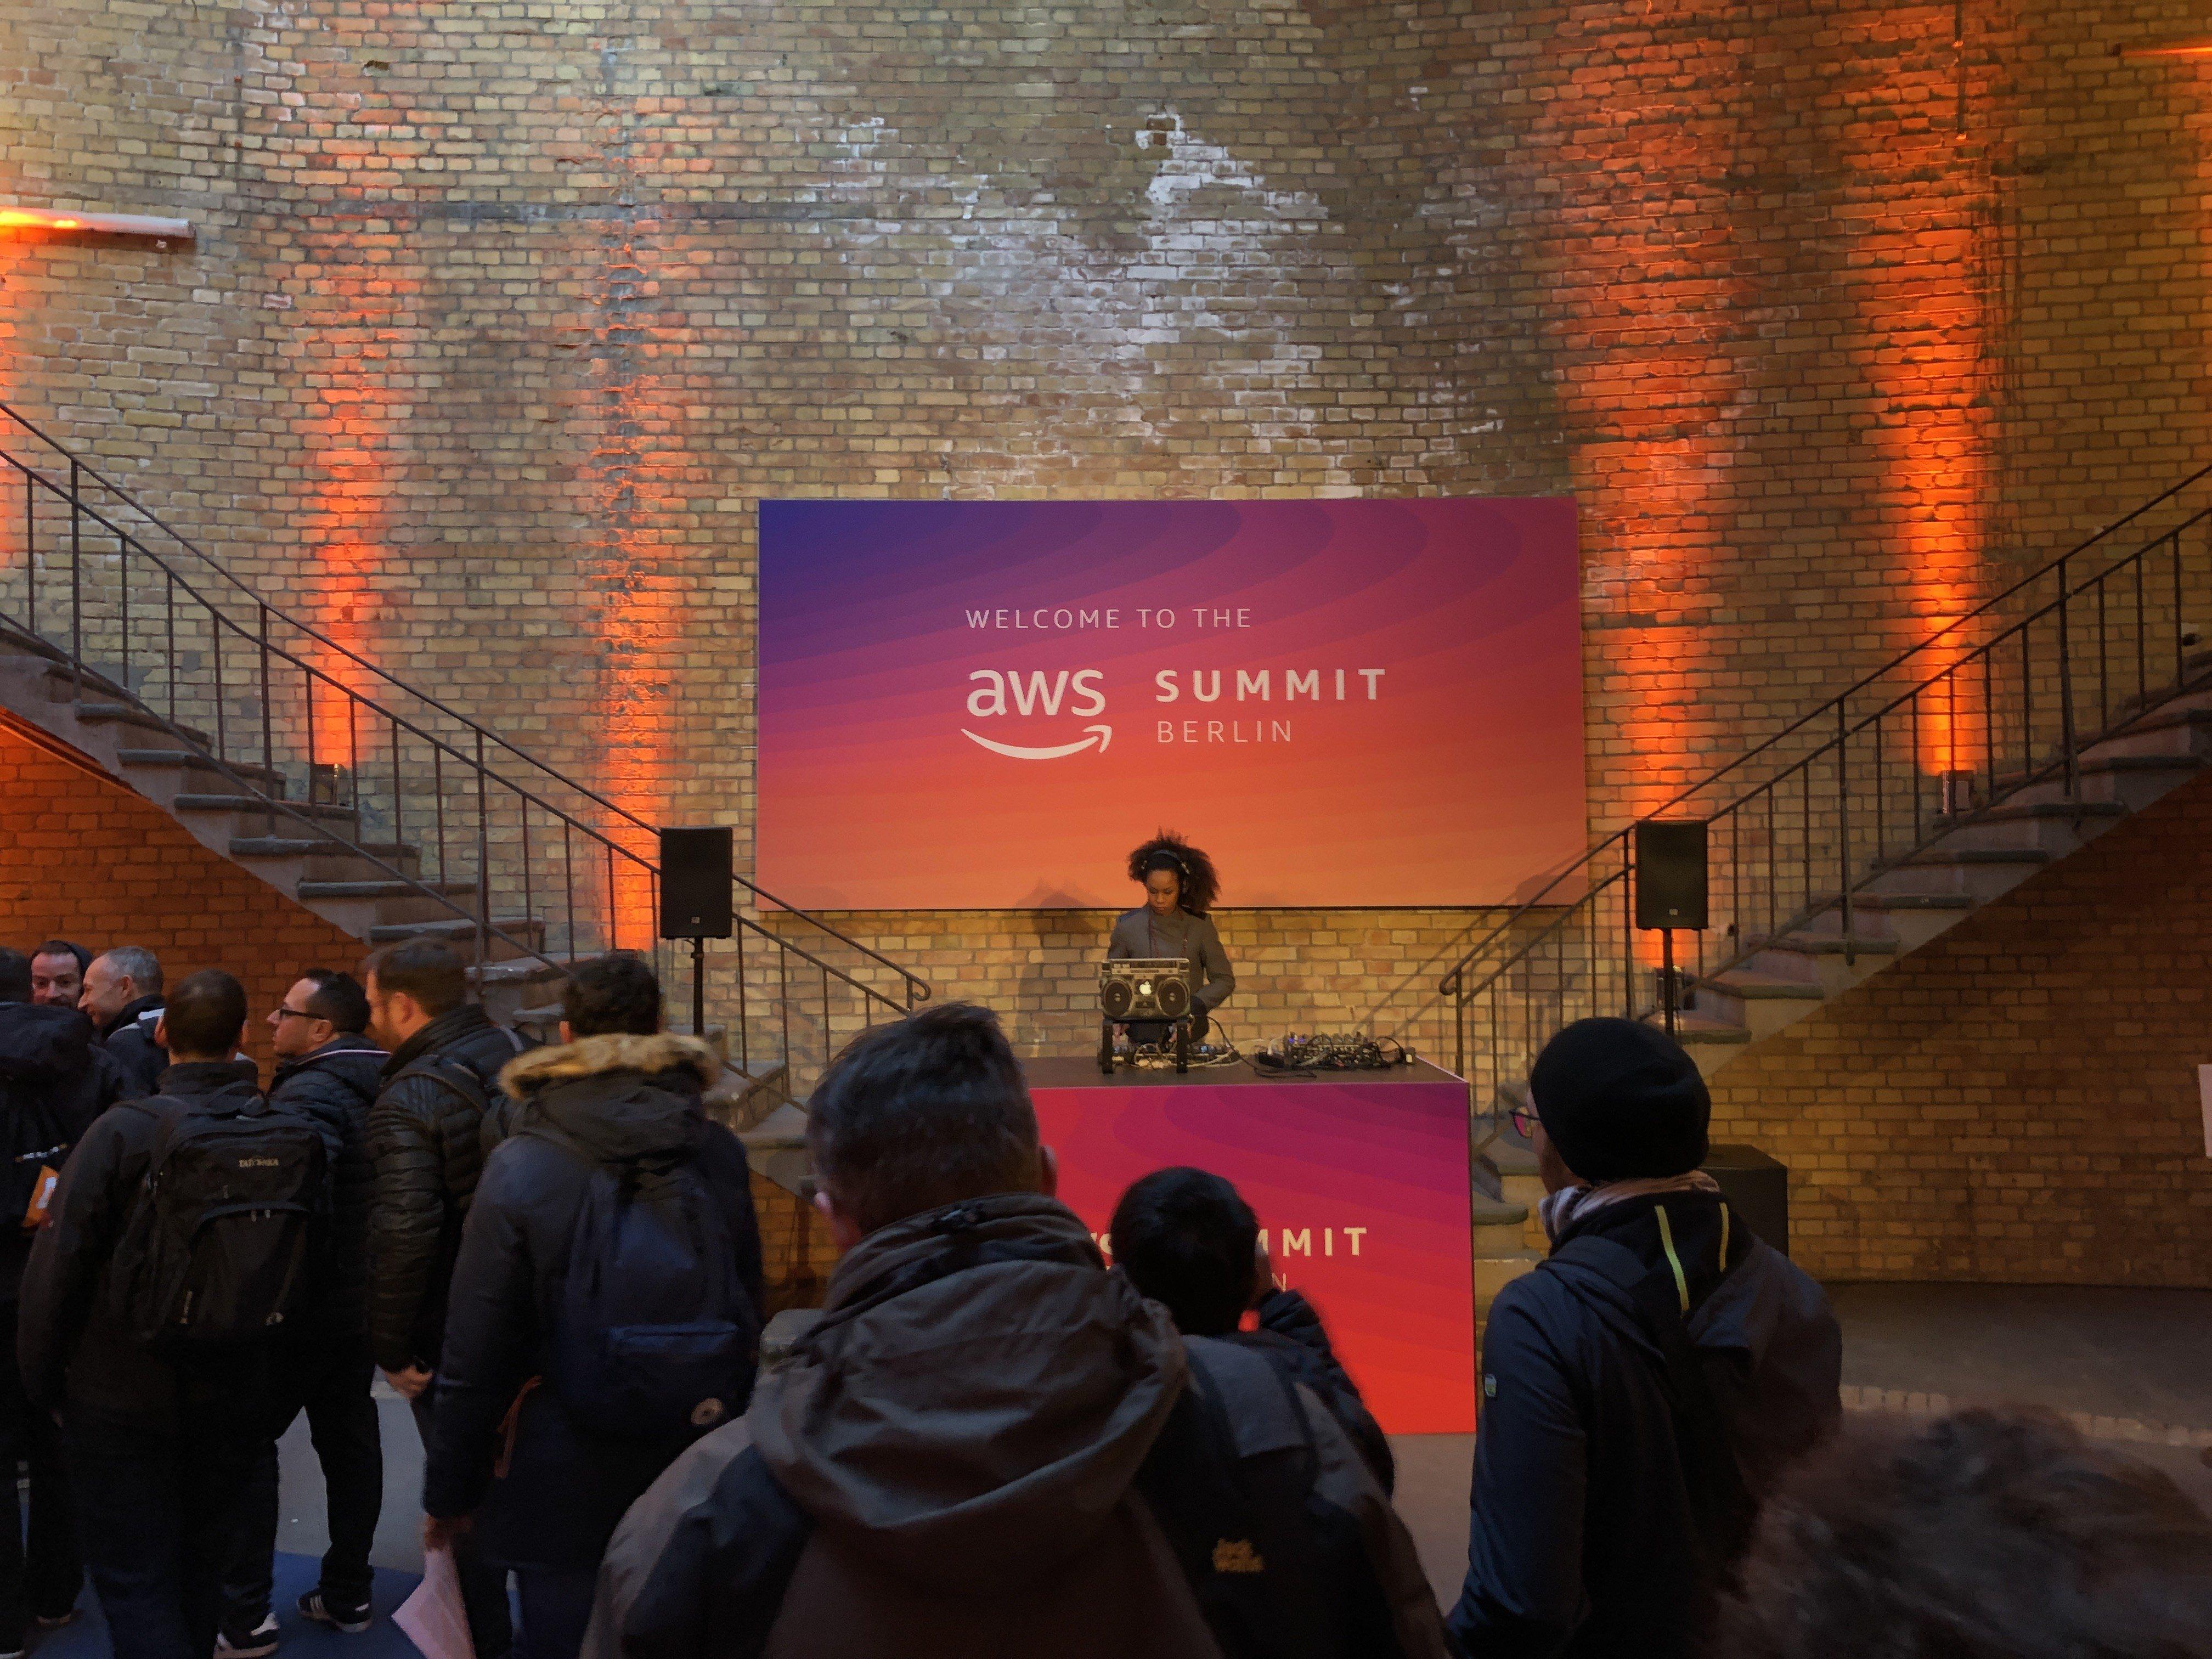 AWS Summit Berlin 2019 | My View | MarcCreighton co uk